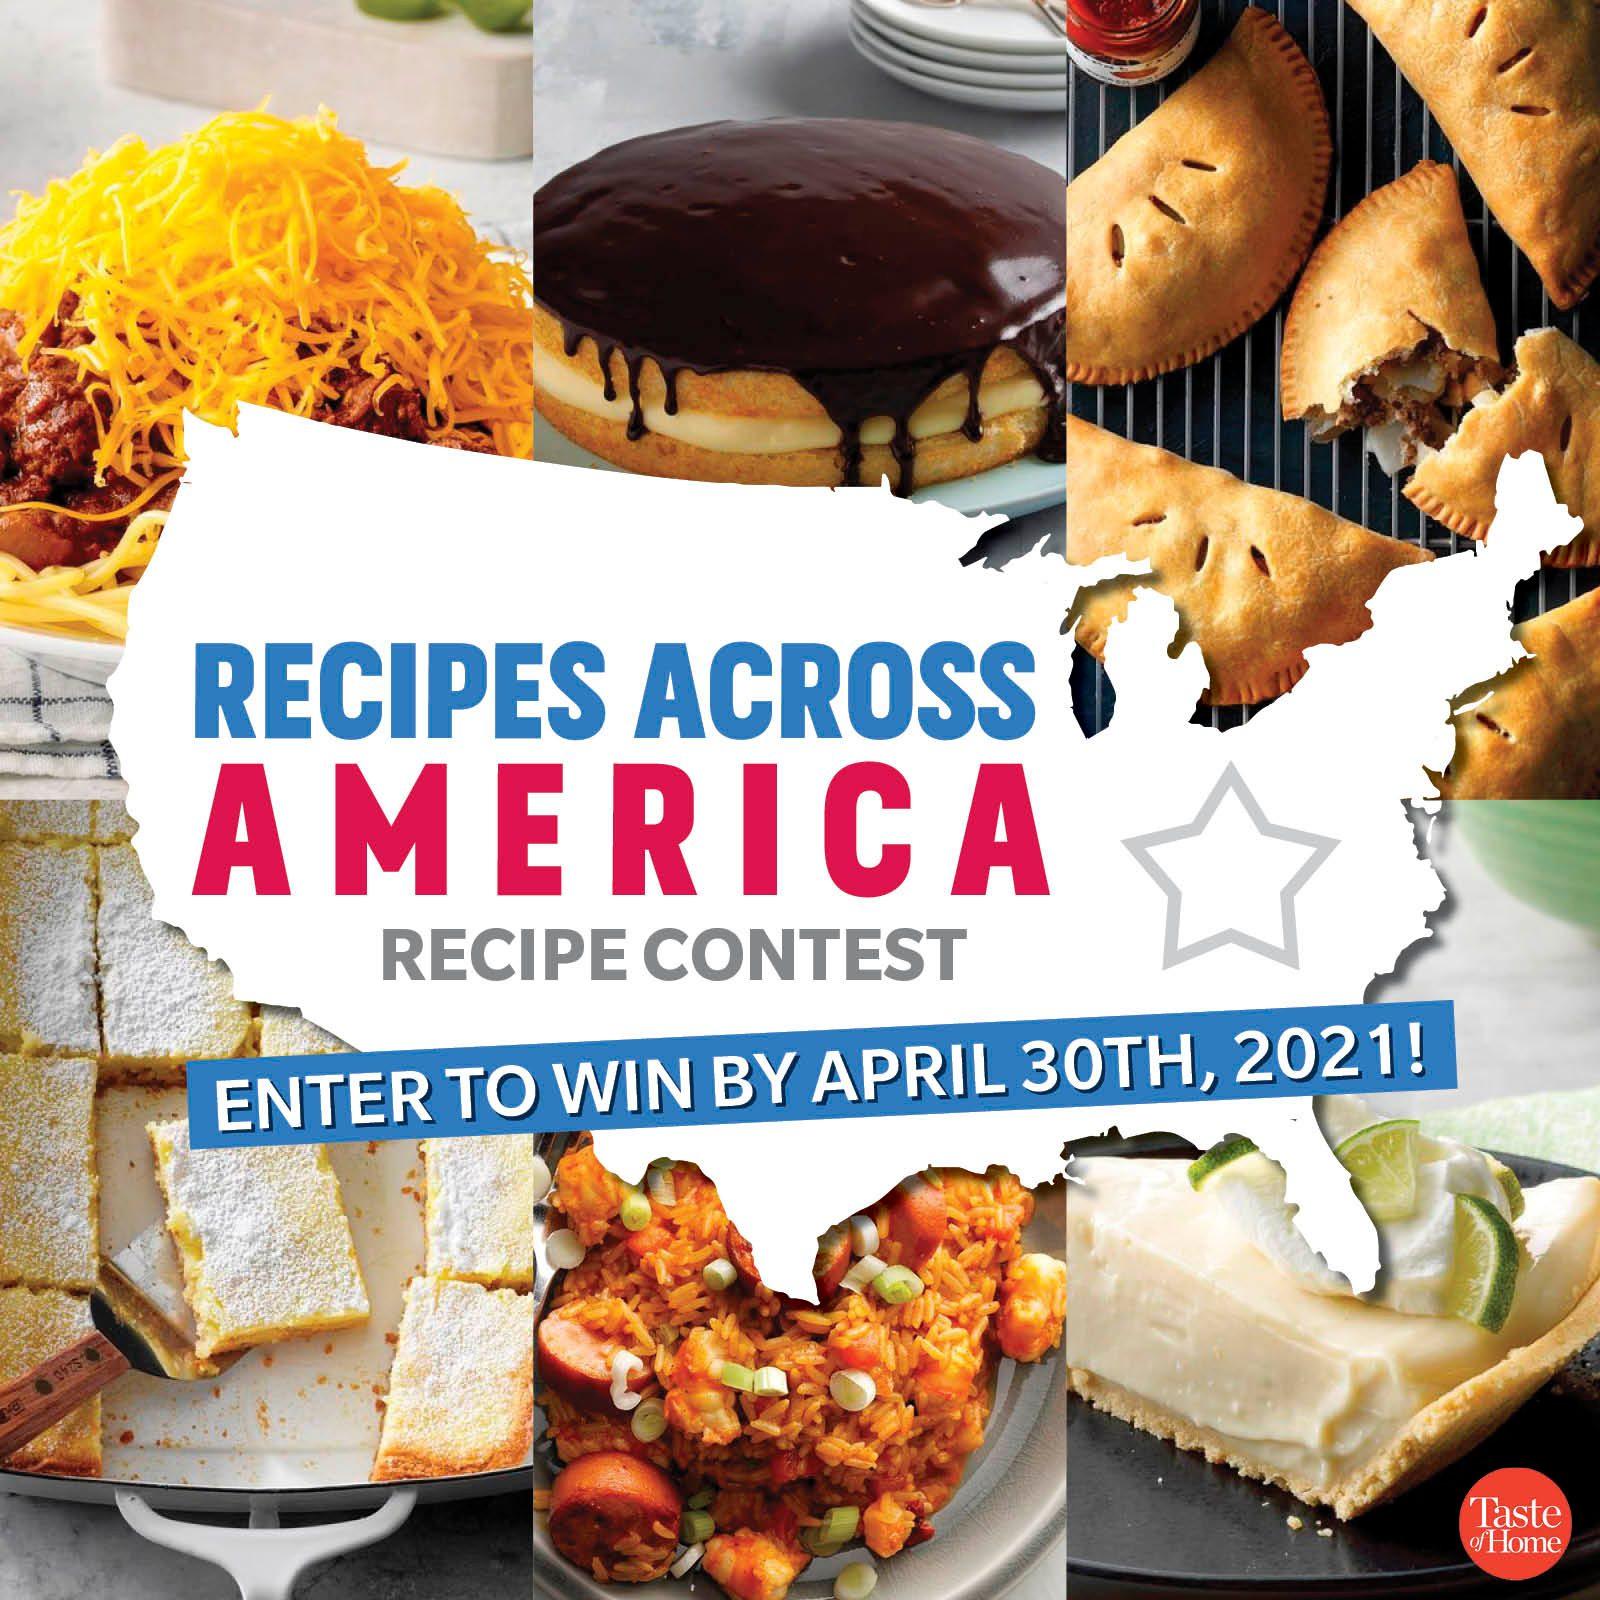 Recipes Across America 1200x1200